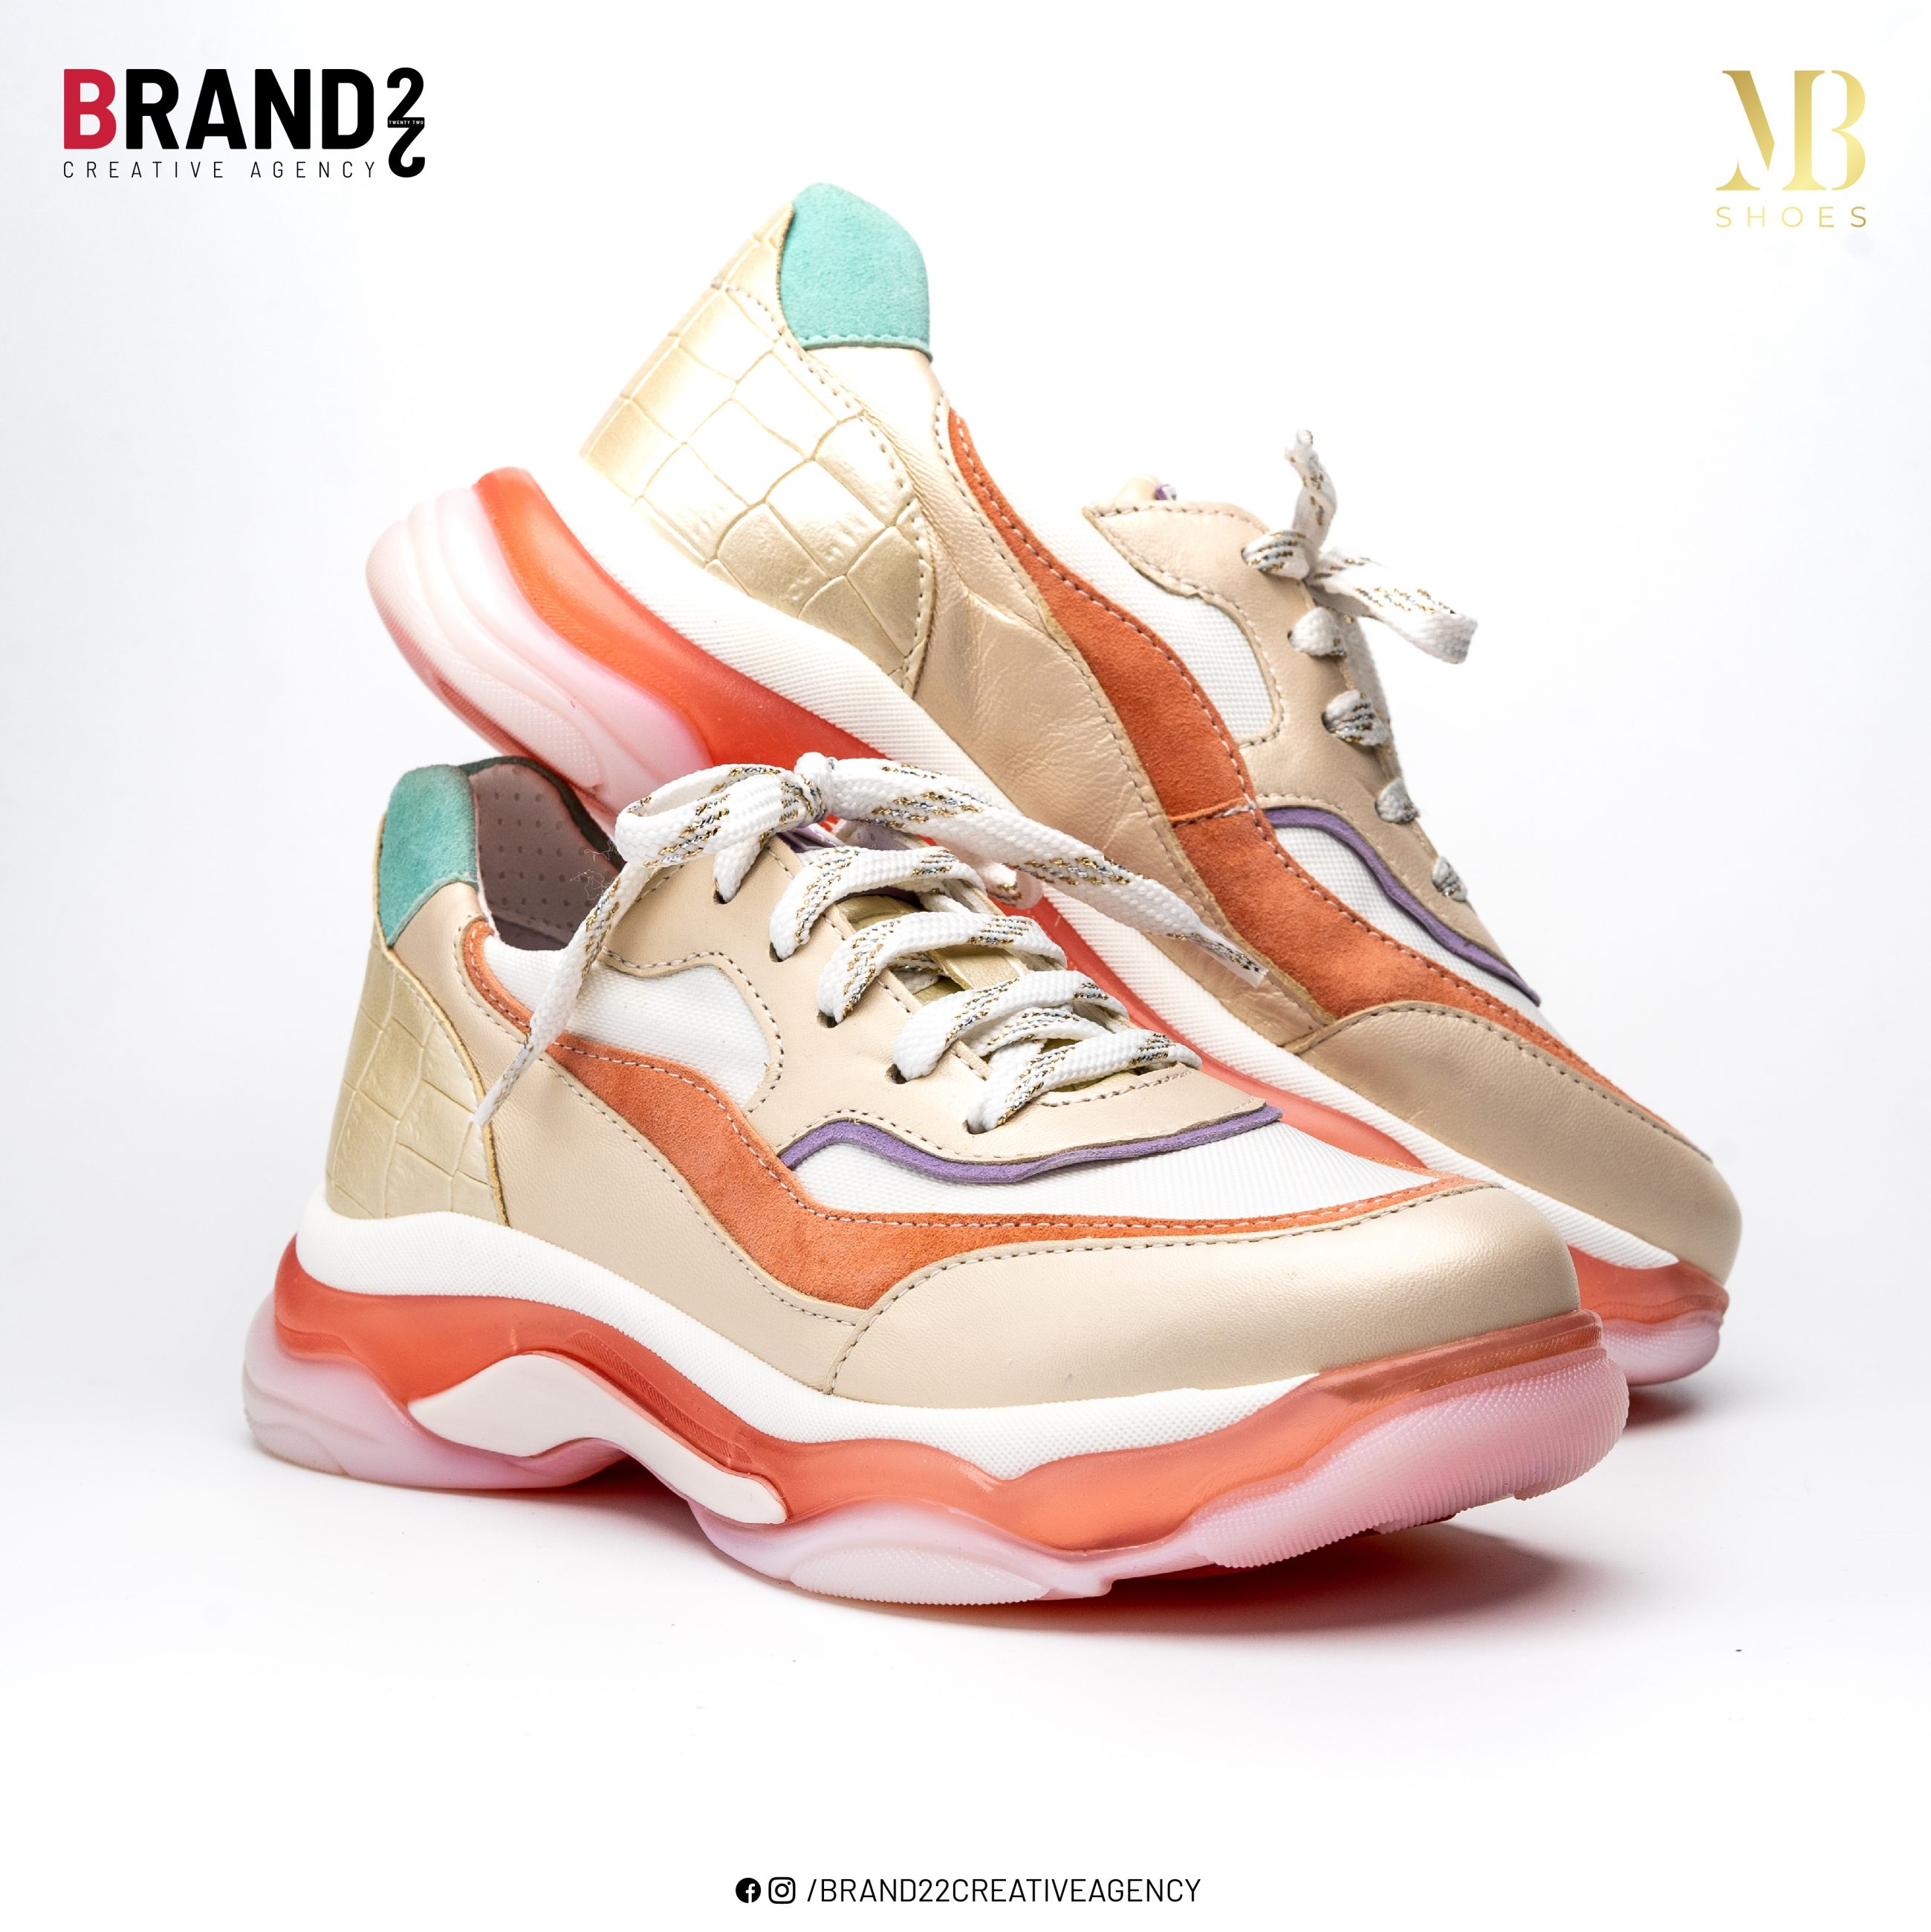 Fotografia de Produto | MB Shoes | Brand 22 Creative Agency